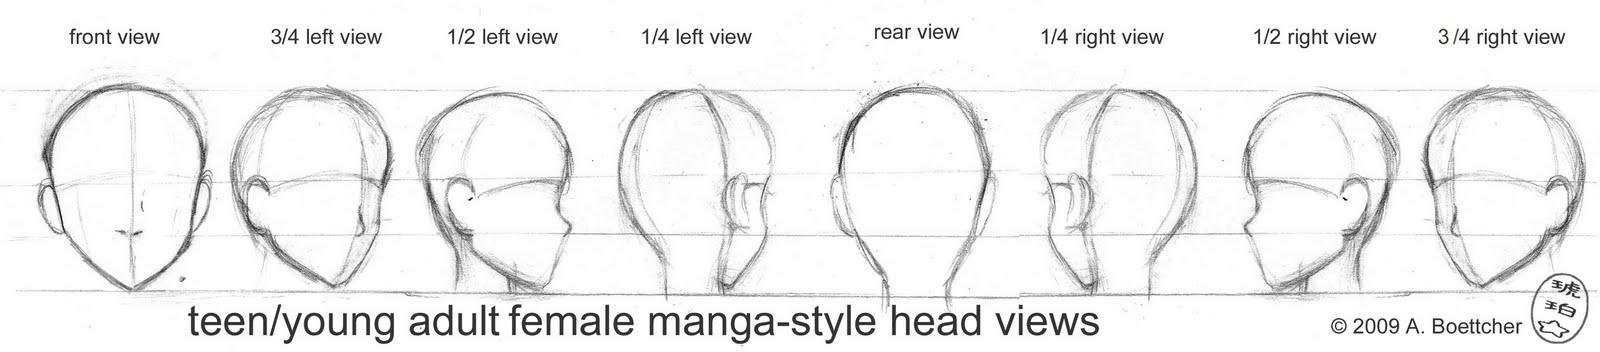 Manga stringz 2011 04 10 for Manga character template